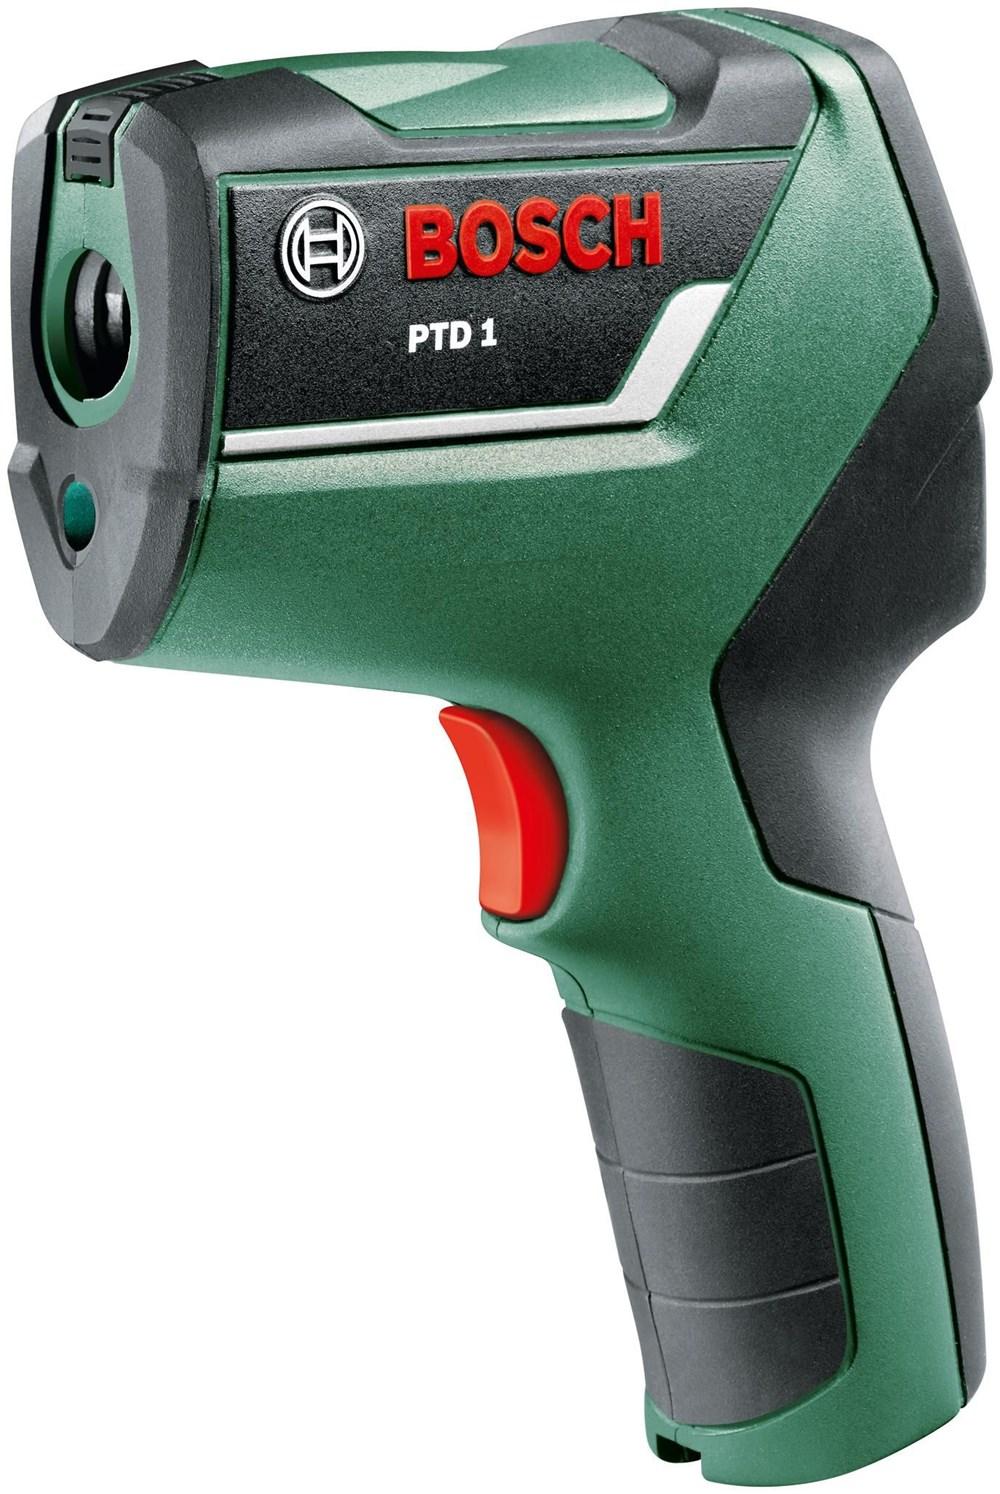 Bosch PTD 1 (Bauthermometer) 0.603.683.000